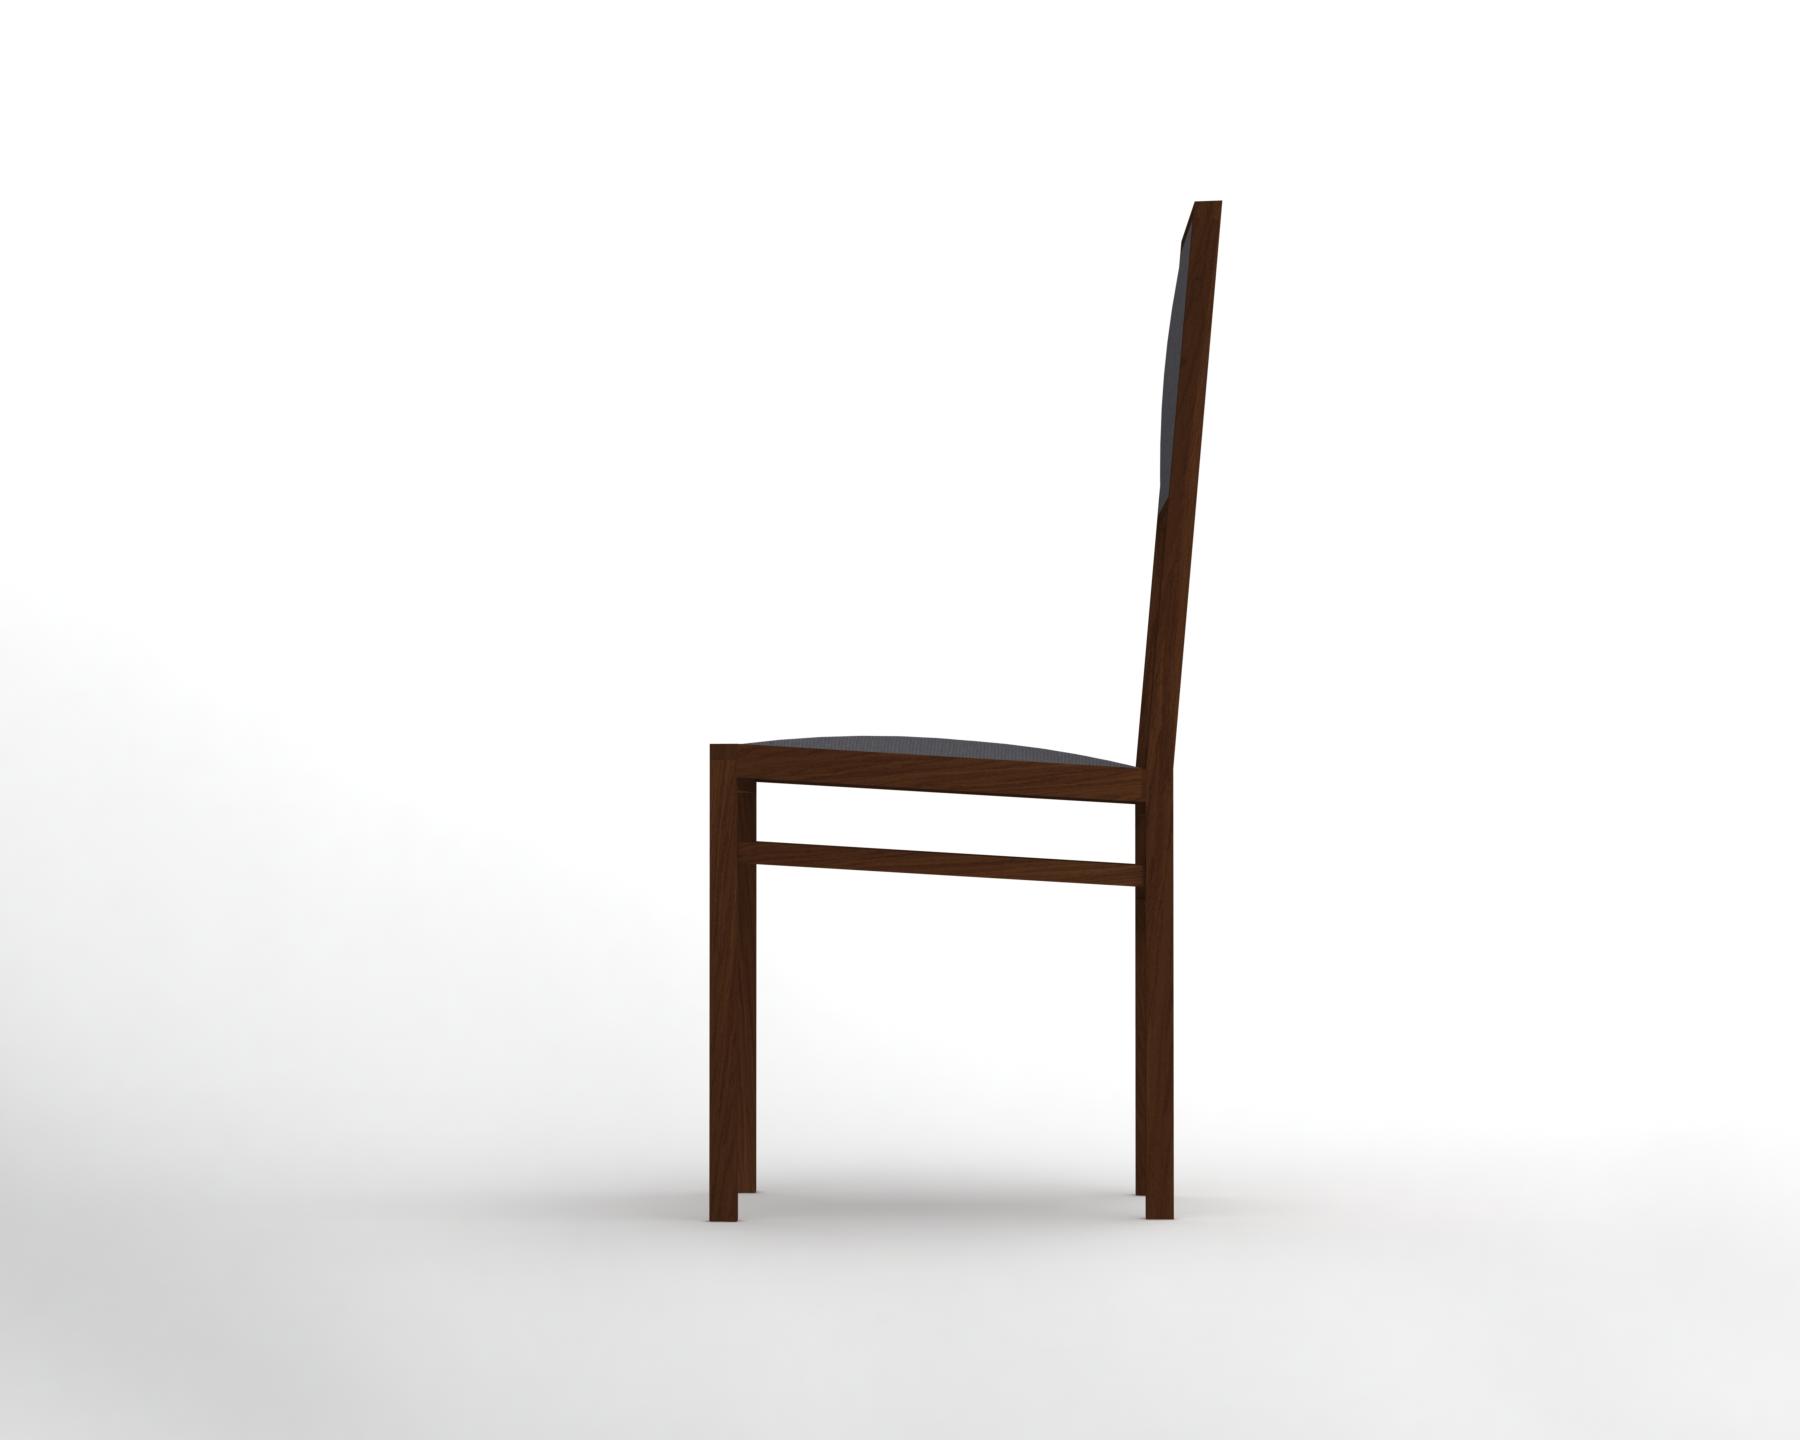 chair_03_side.JPG